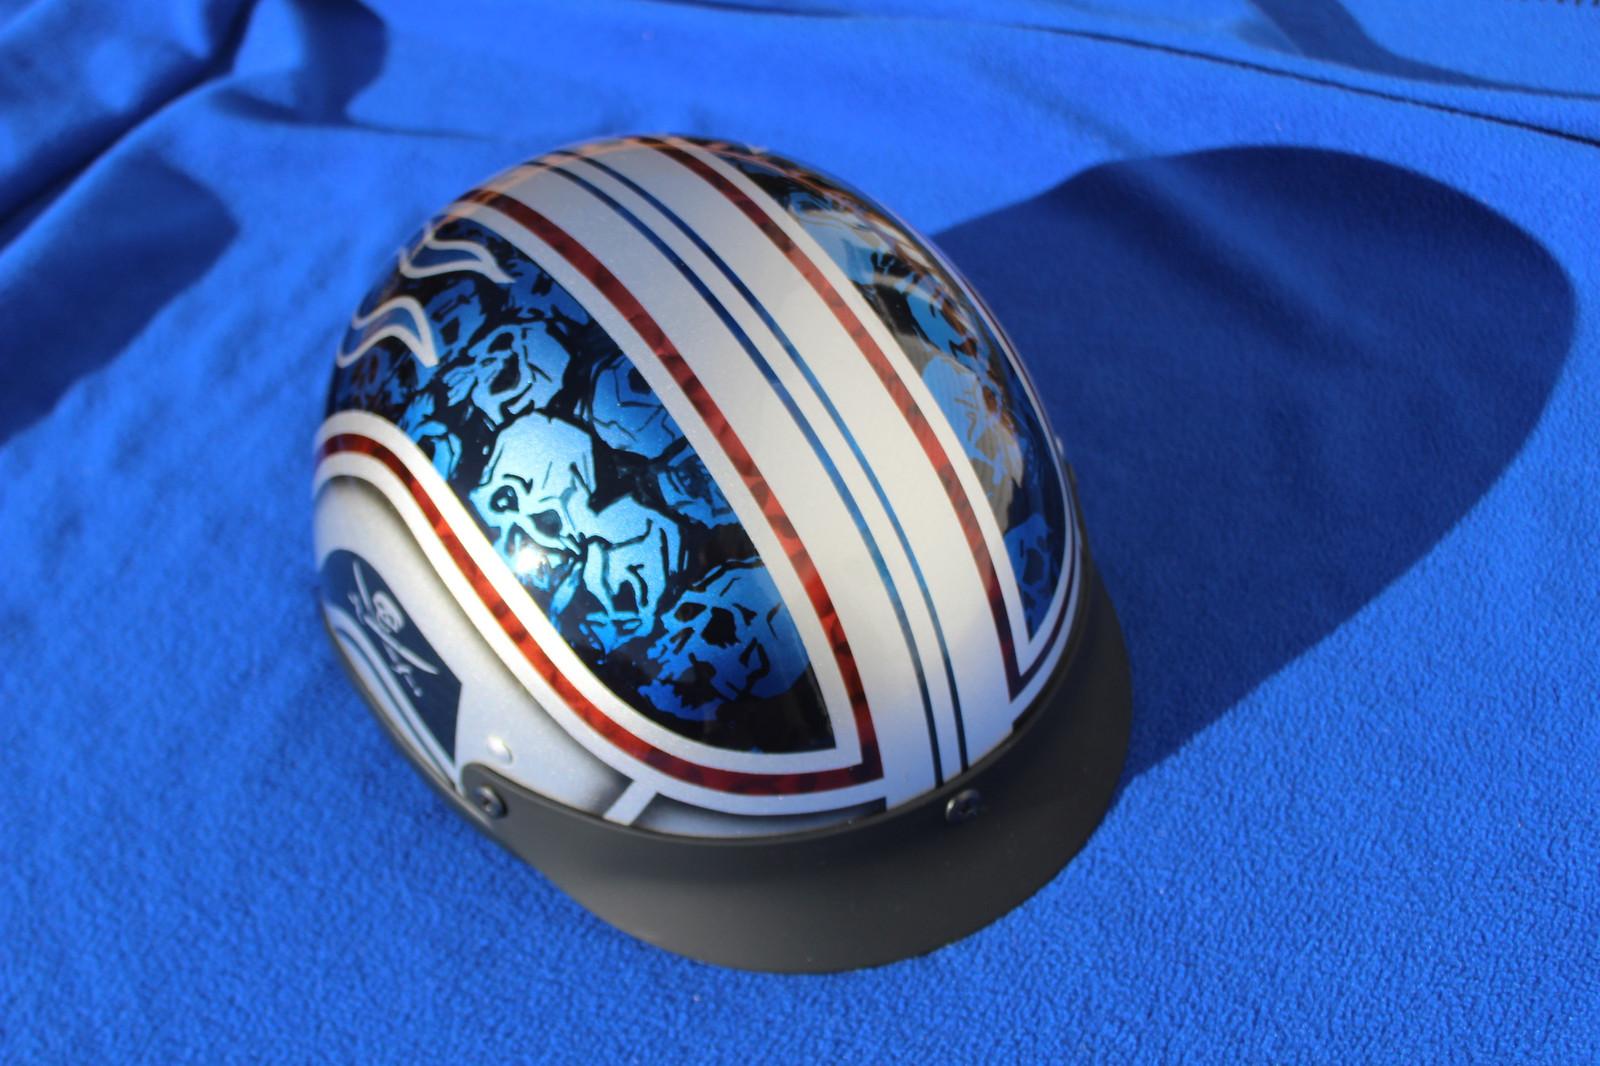 d21b5a5ff2f7 Motorcycle Helmets- Skulls and Stripes. Custom Action